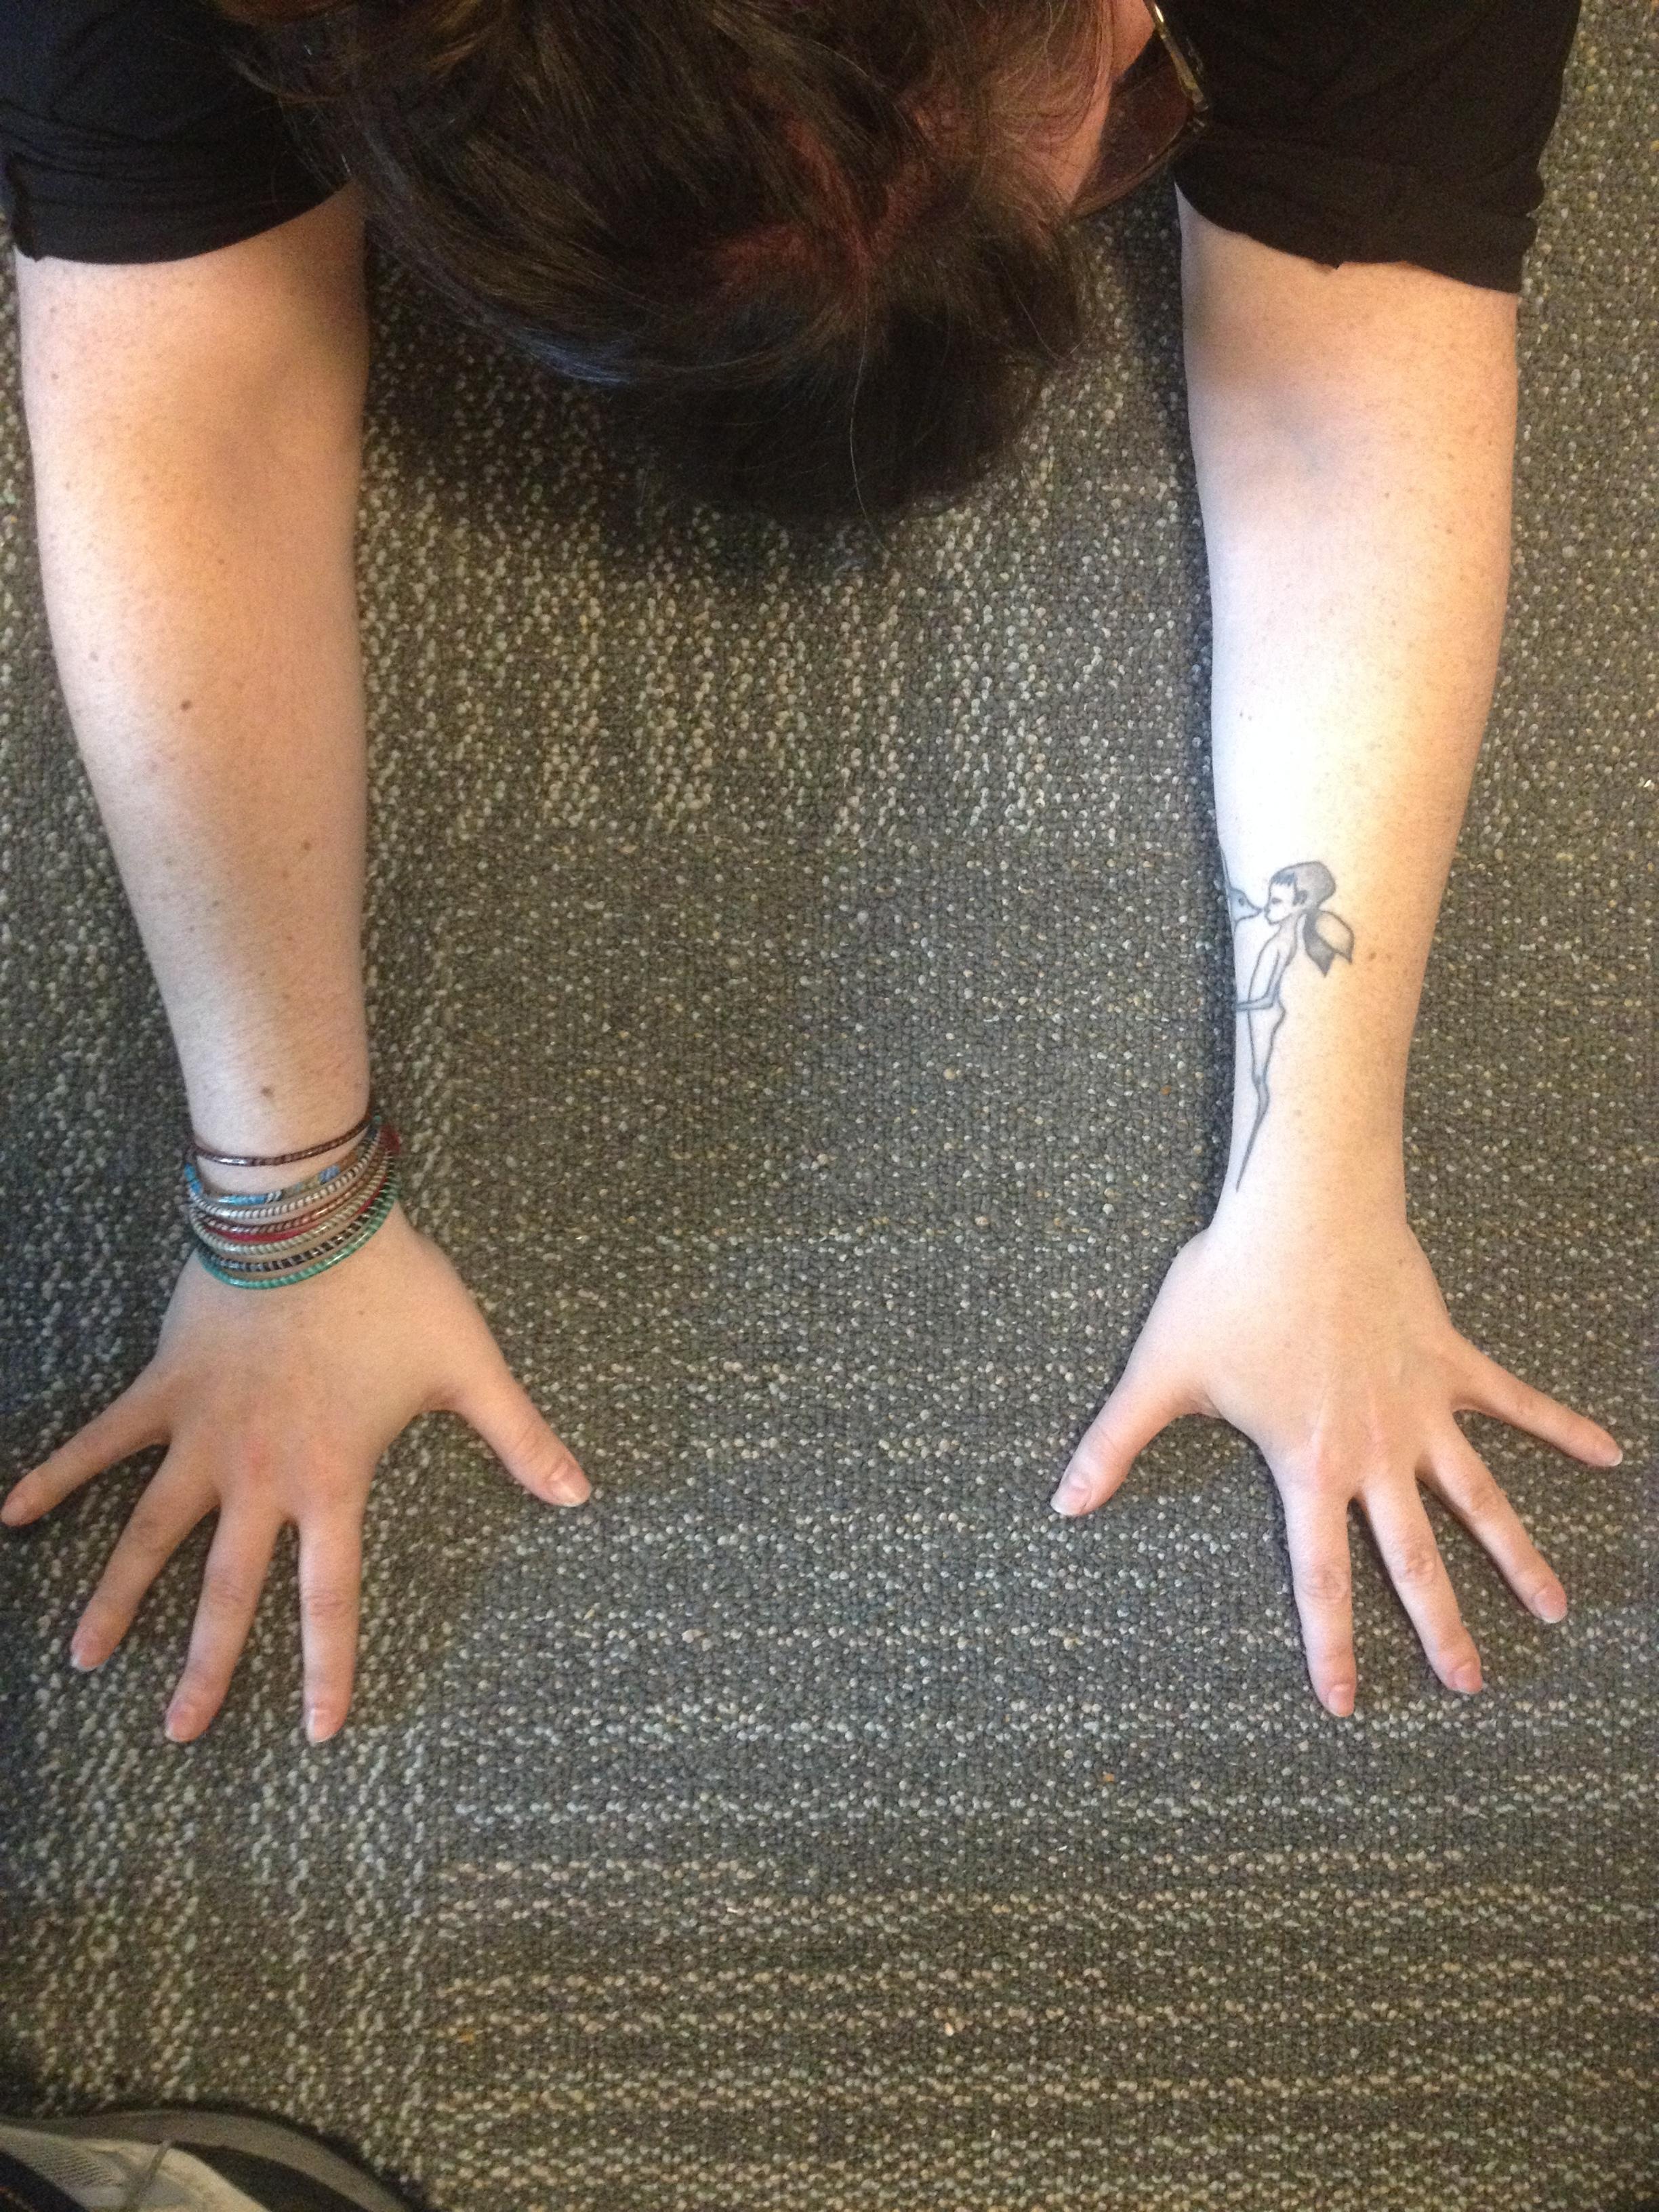 Comparing Shoulder Rotations...